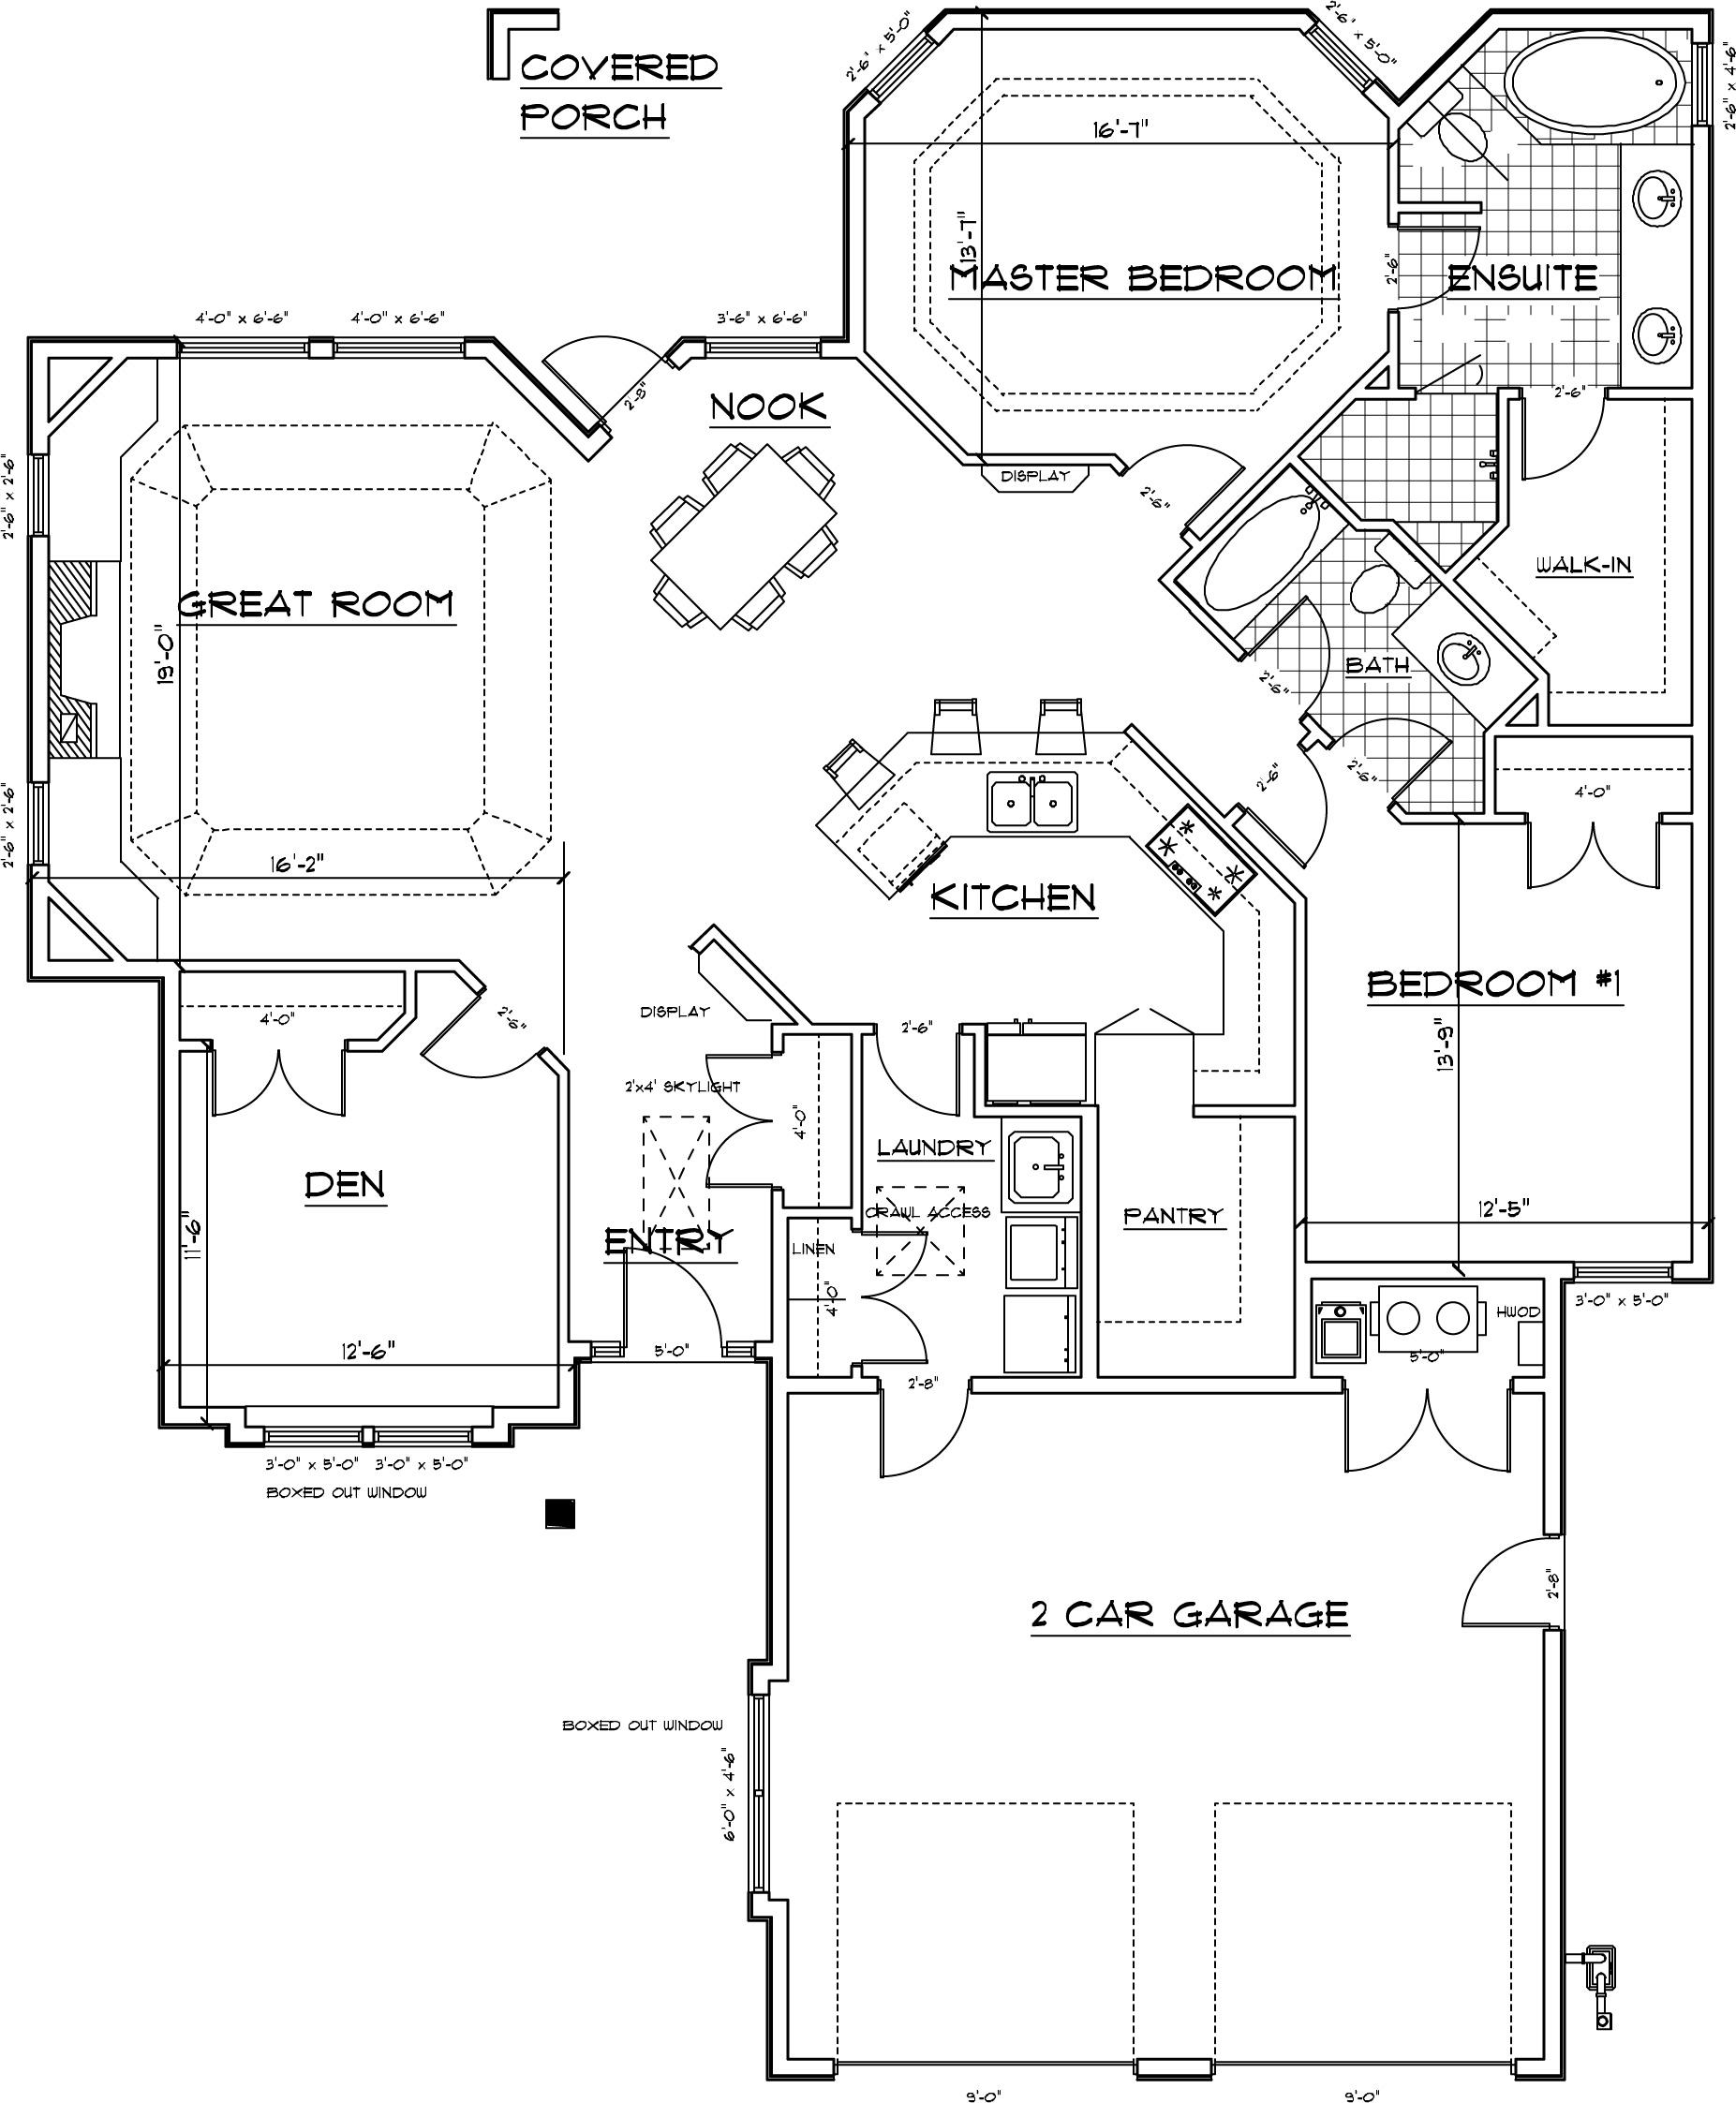 Lot 27 Floorplan.jpg